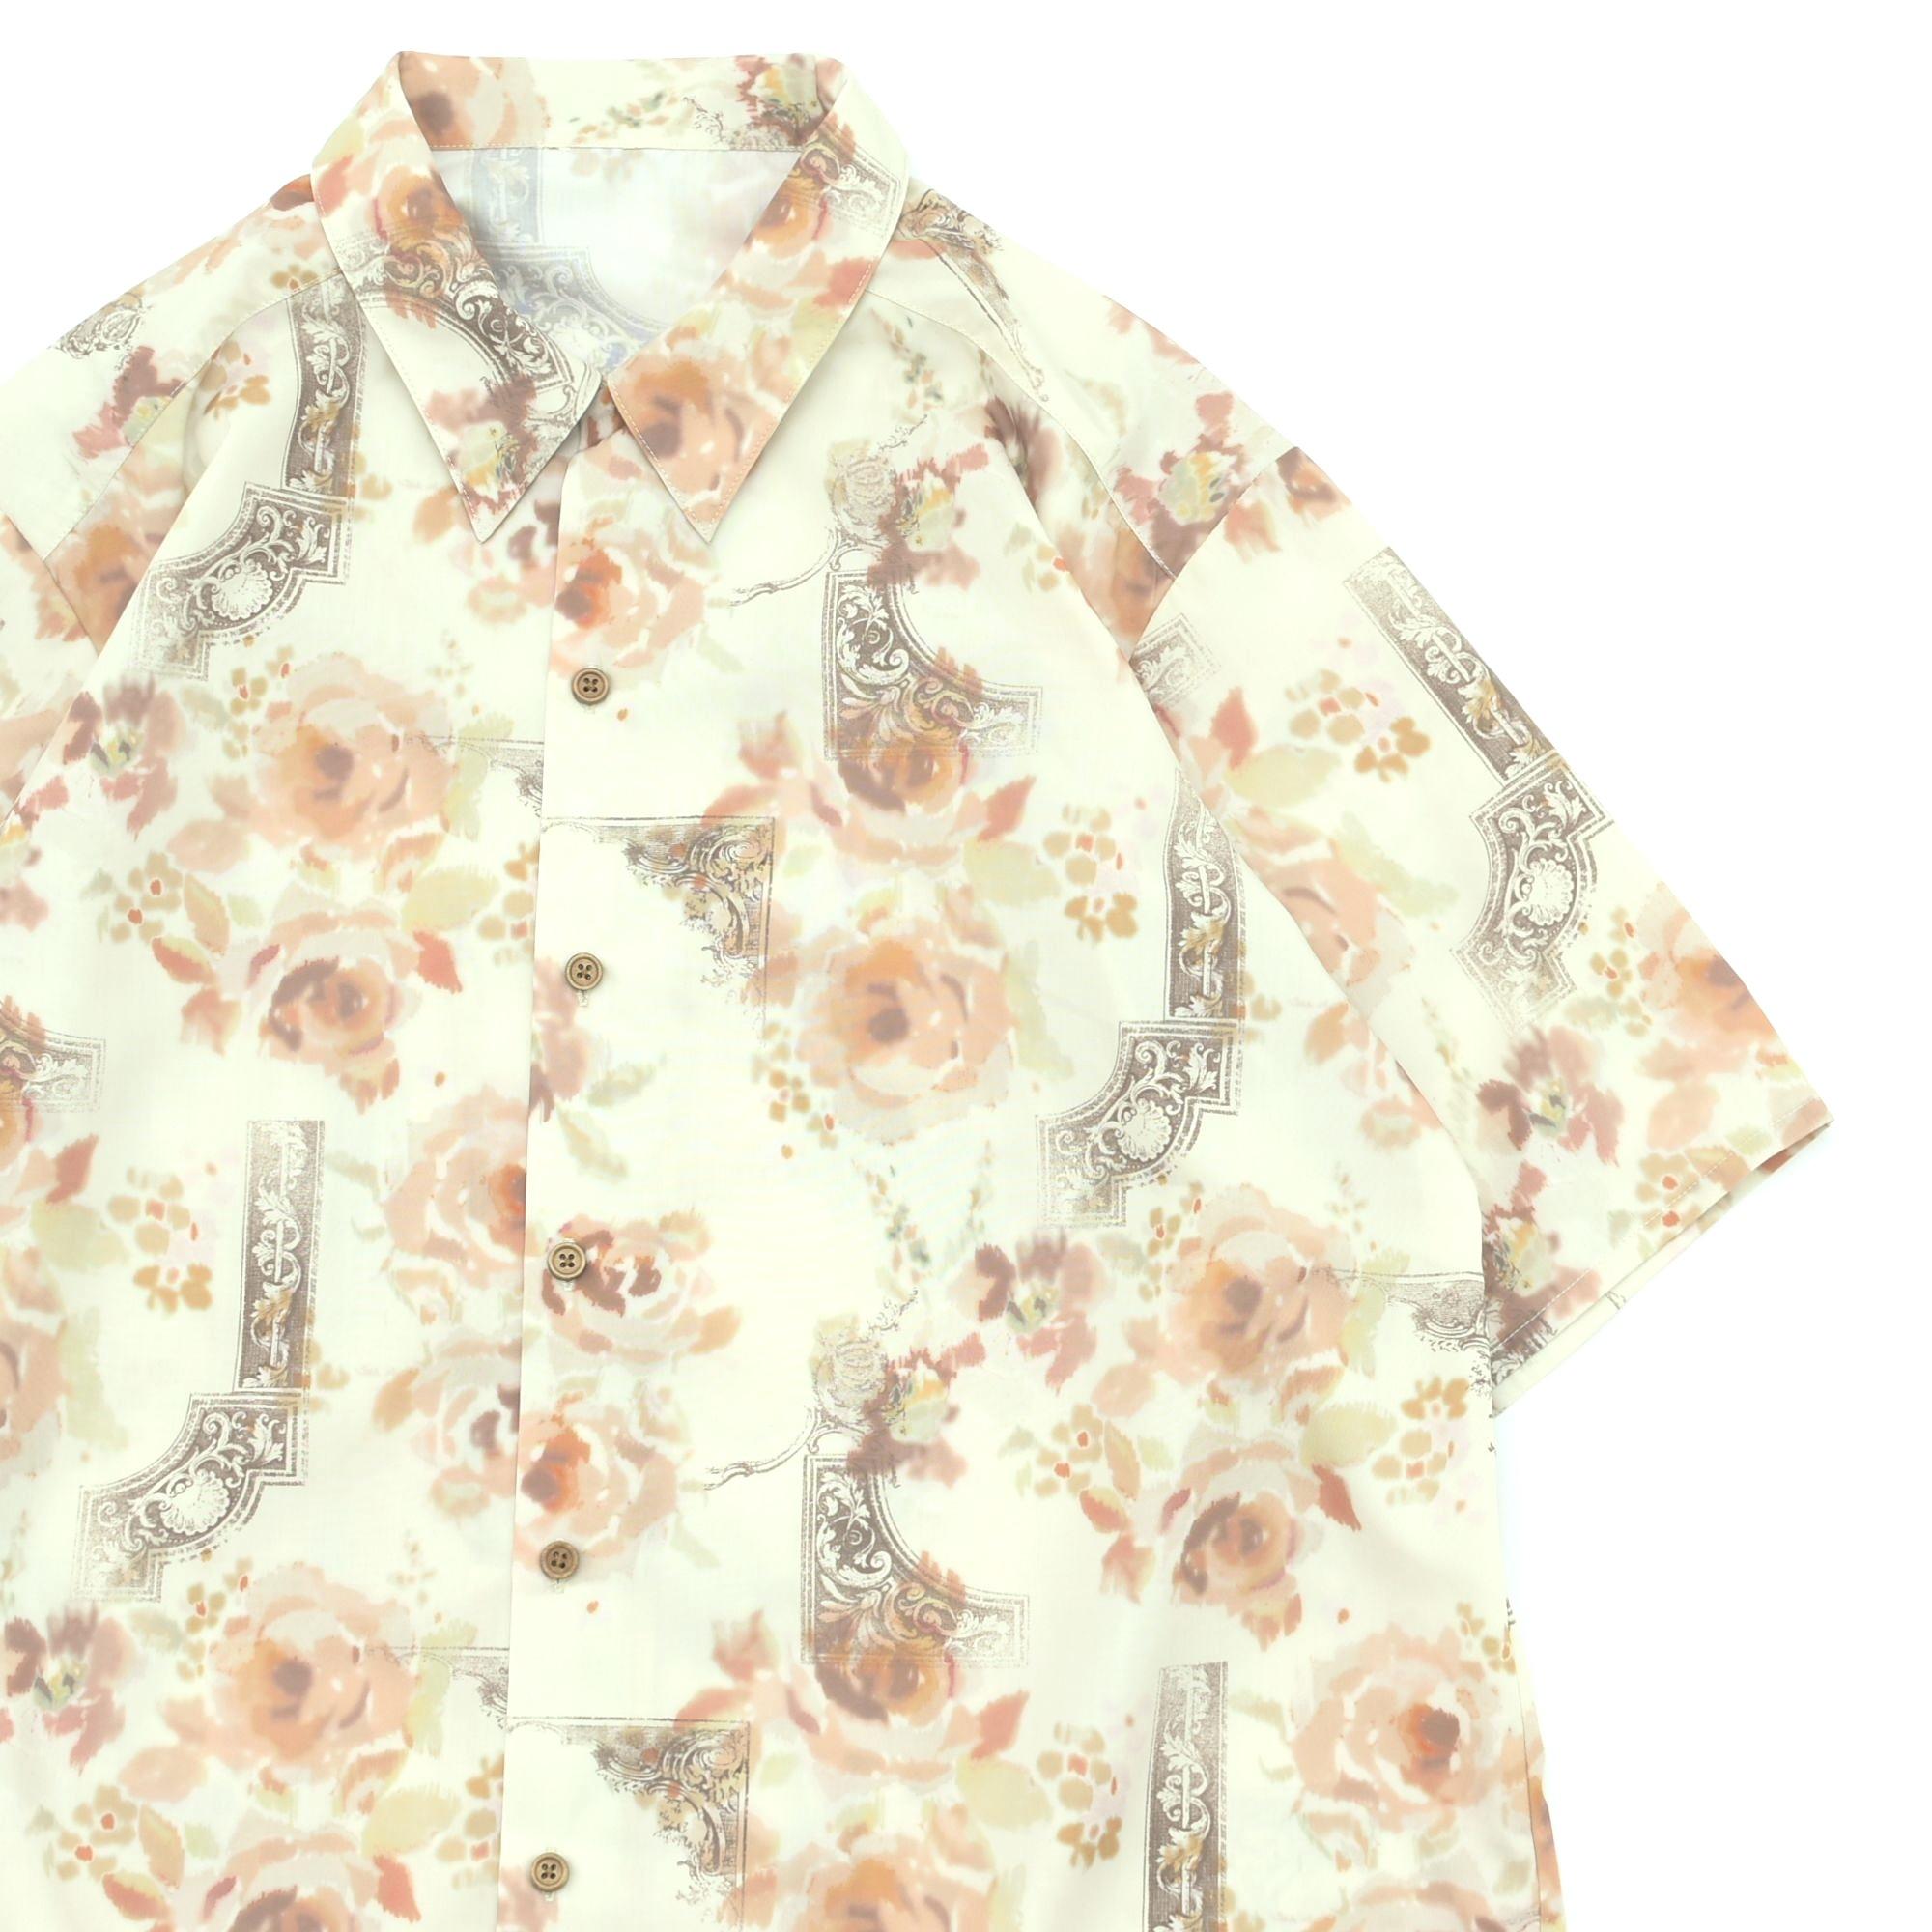 Rose & antique design full pattern open collar shirt